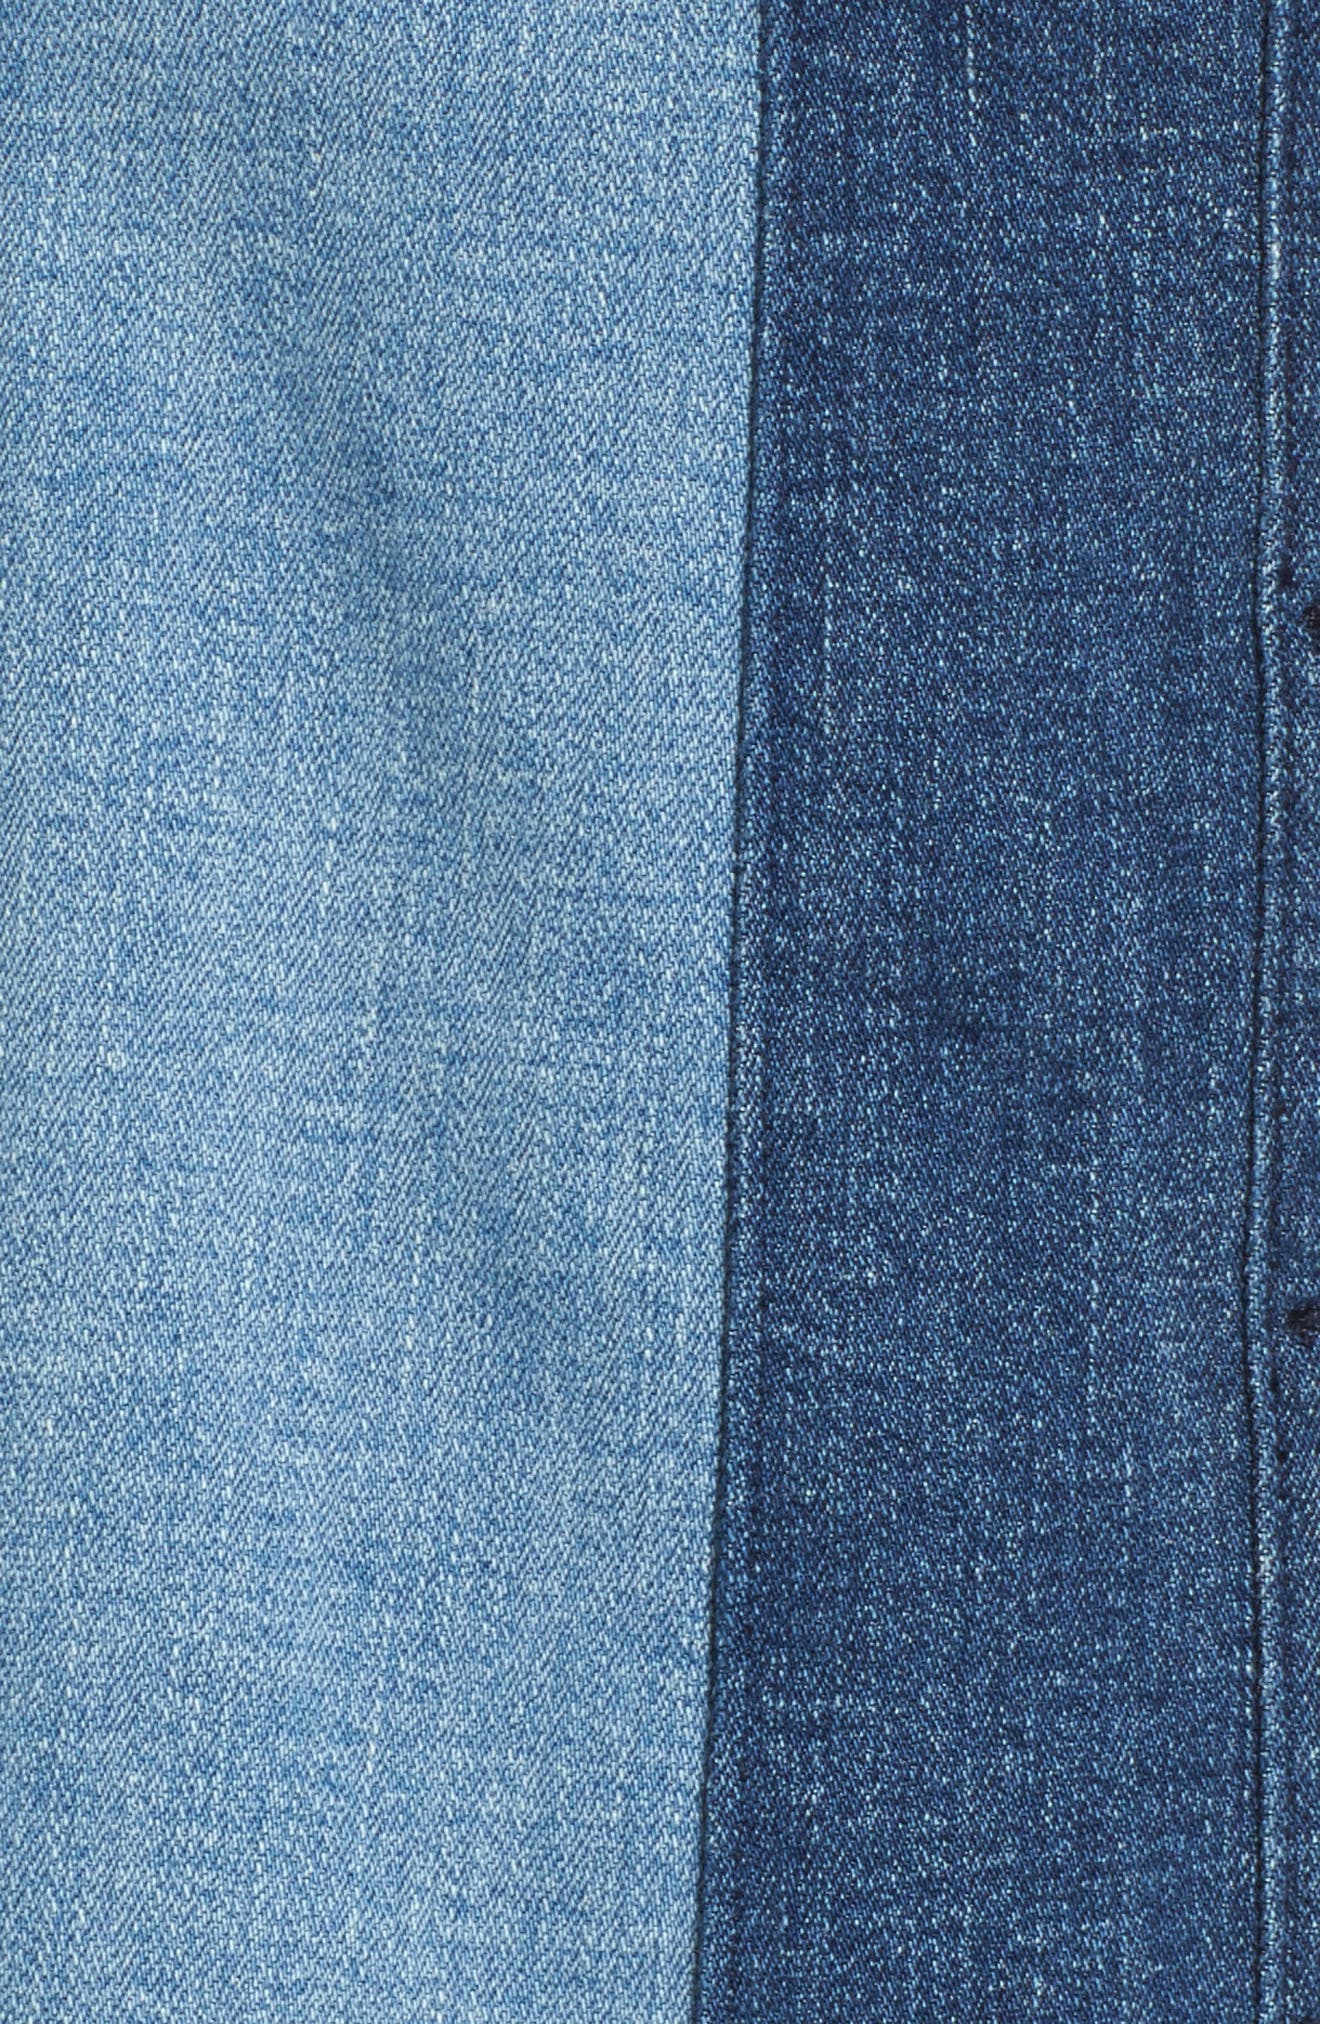 Beatty Denim Miniskirt,                             Alternate thumbnail 5, color,                             Indigo